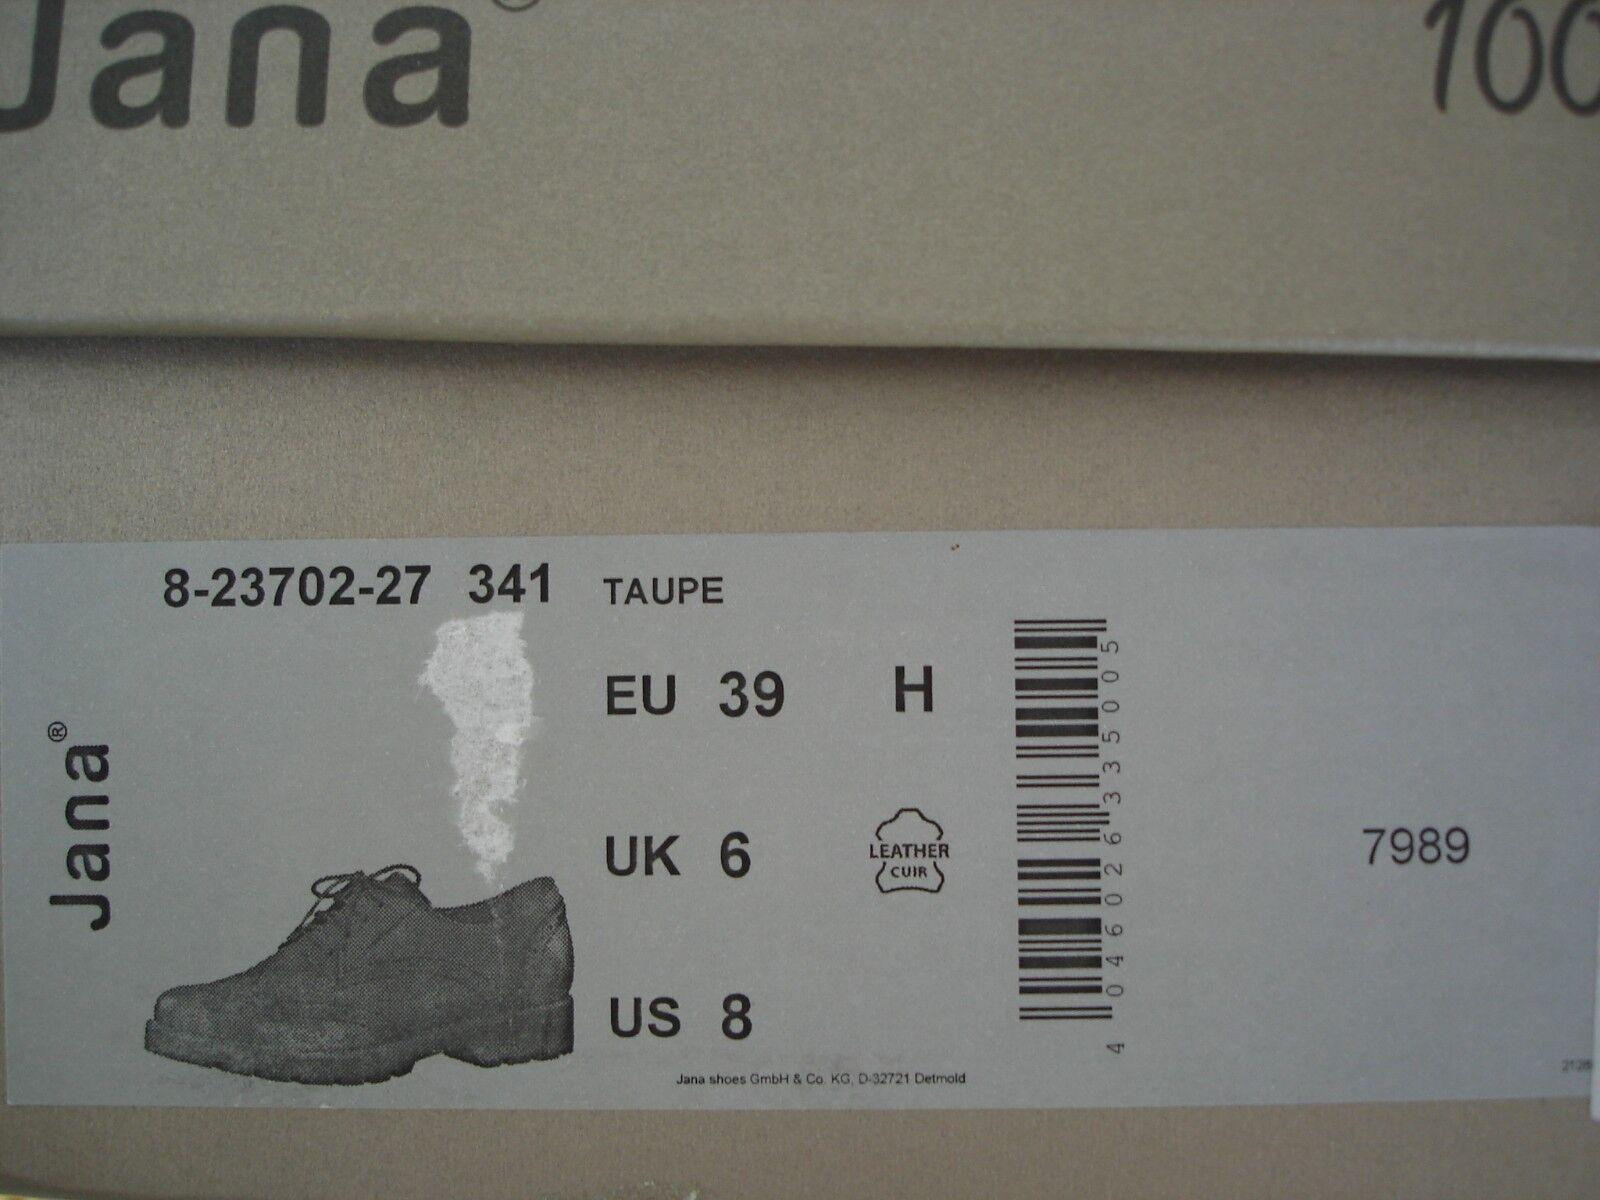 Jana Damen Schuhe Halbschuhe Schnürschuhe Gr. 39 taupe NEU